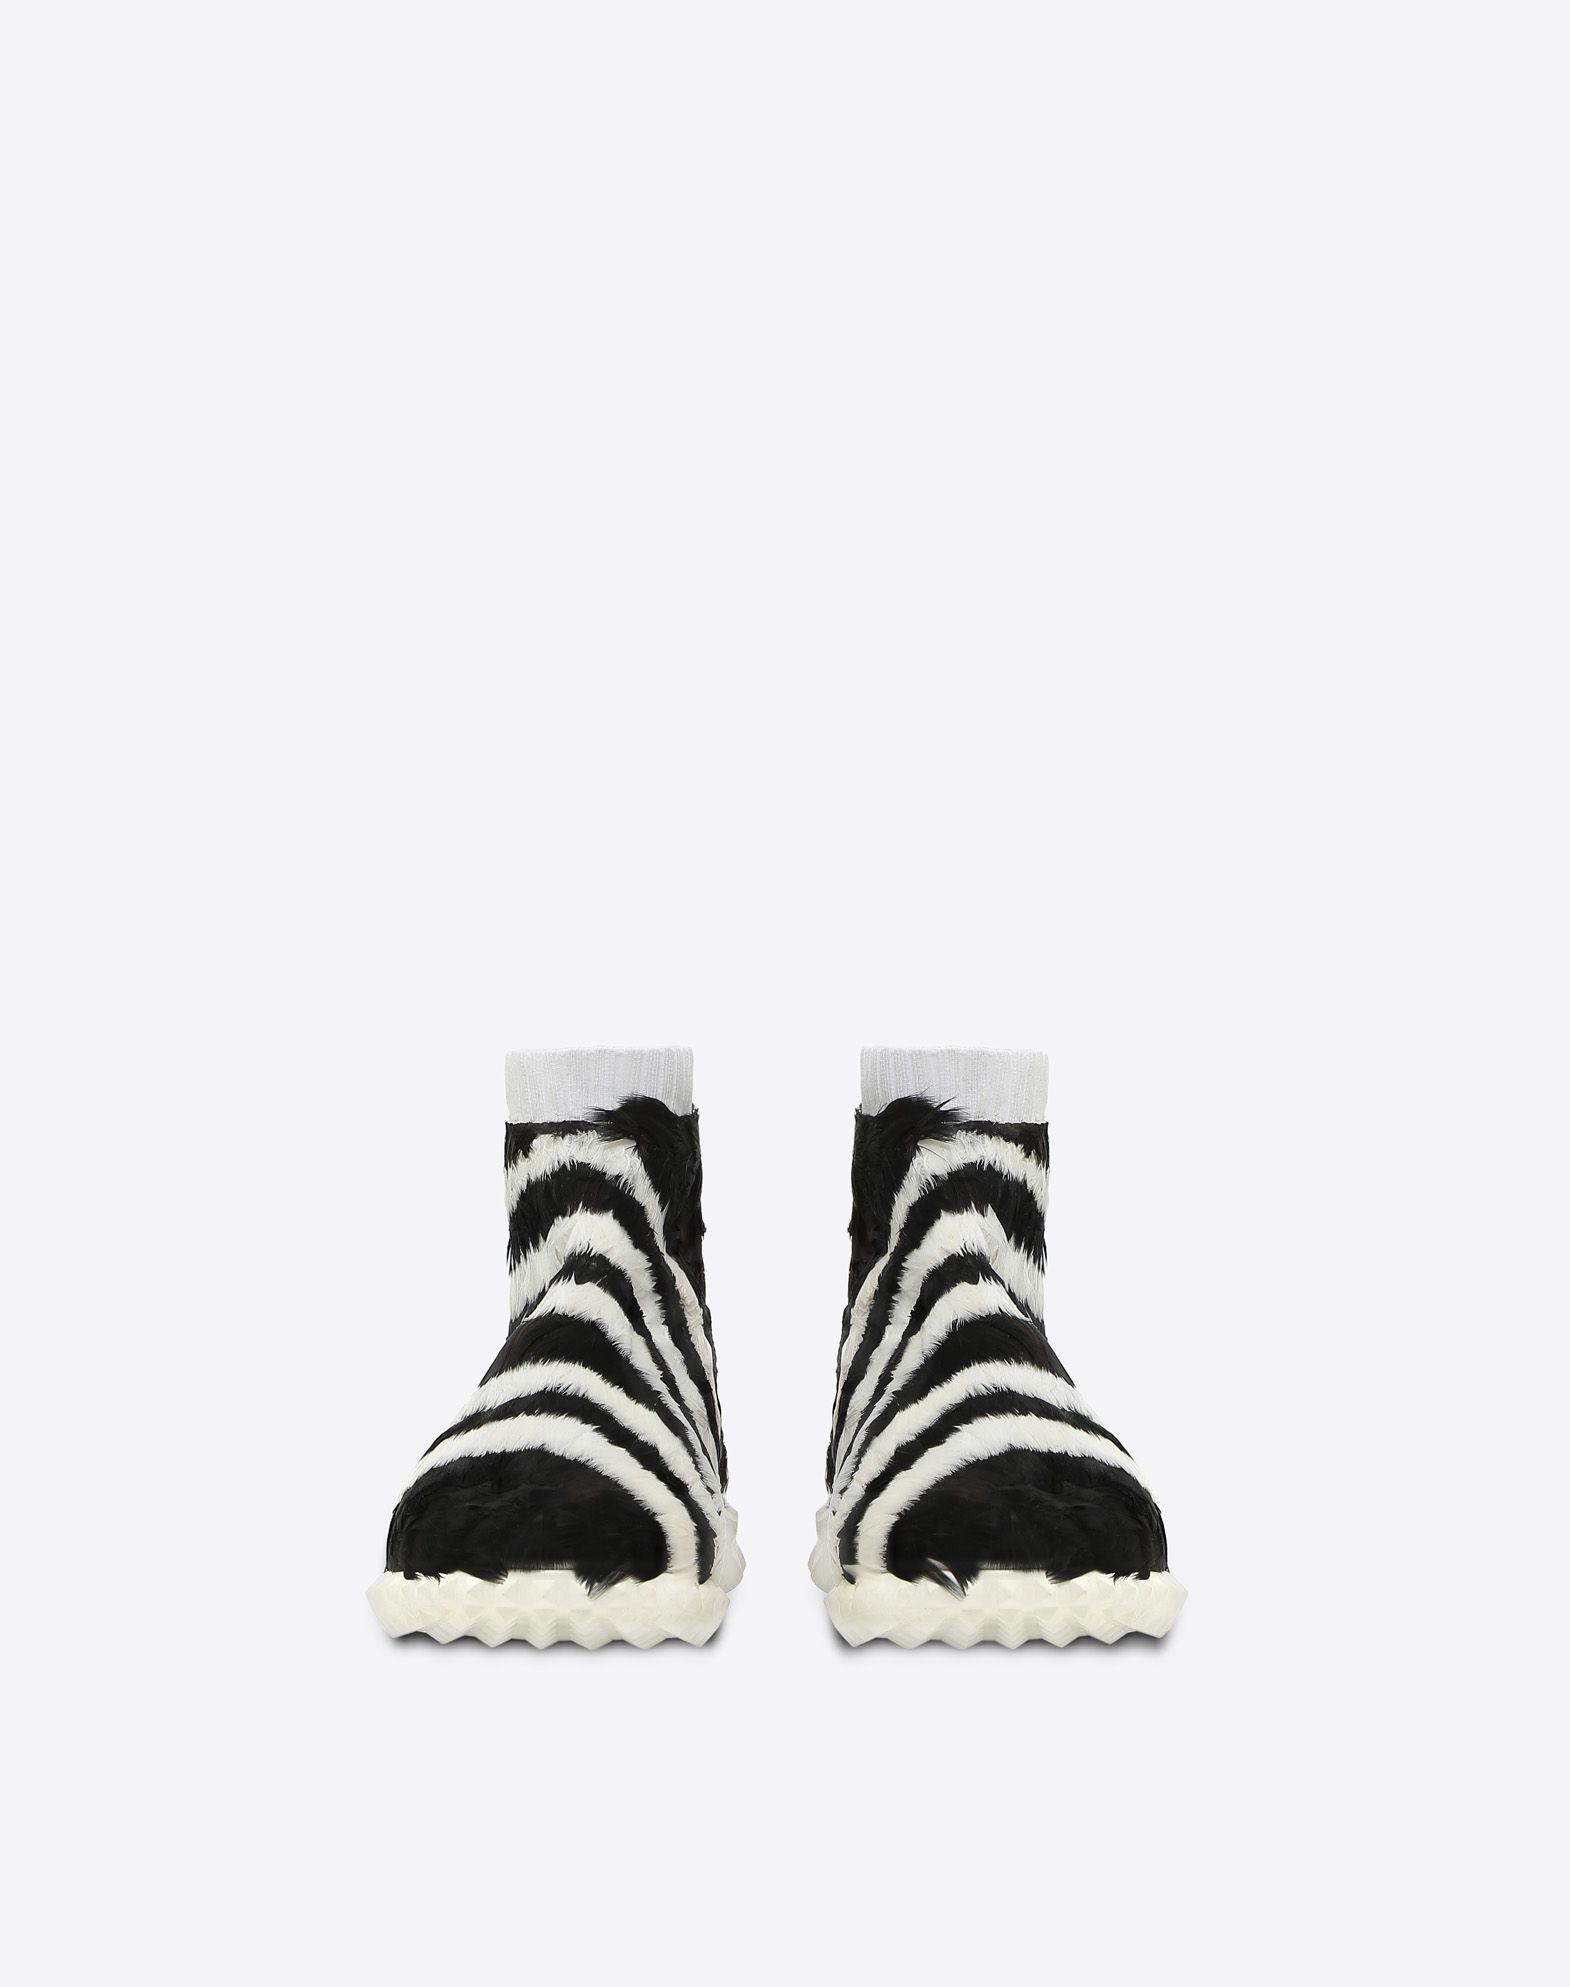 VALENTINO GARAVANI Sneakers con plumas SNEAKERS ALTAS D e